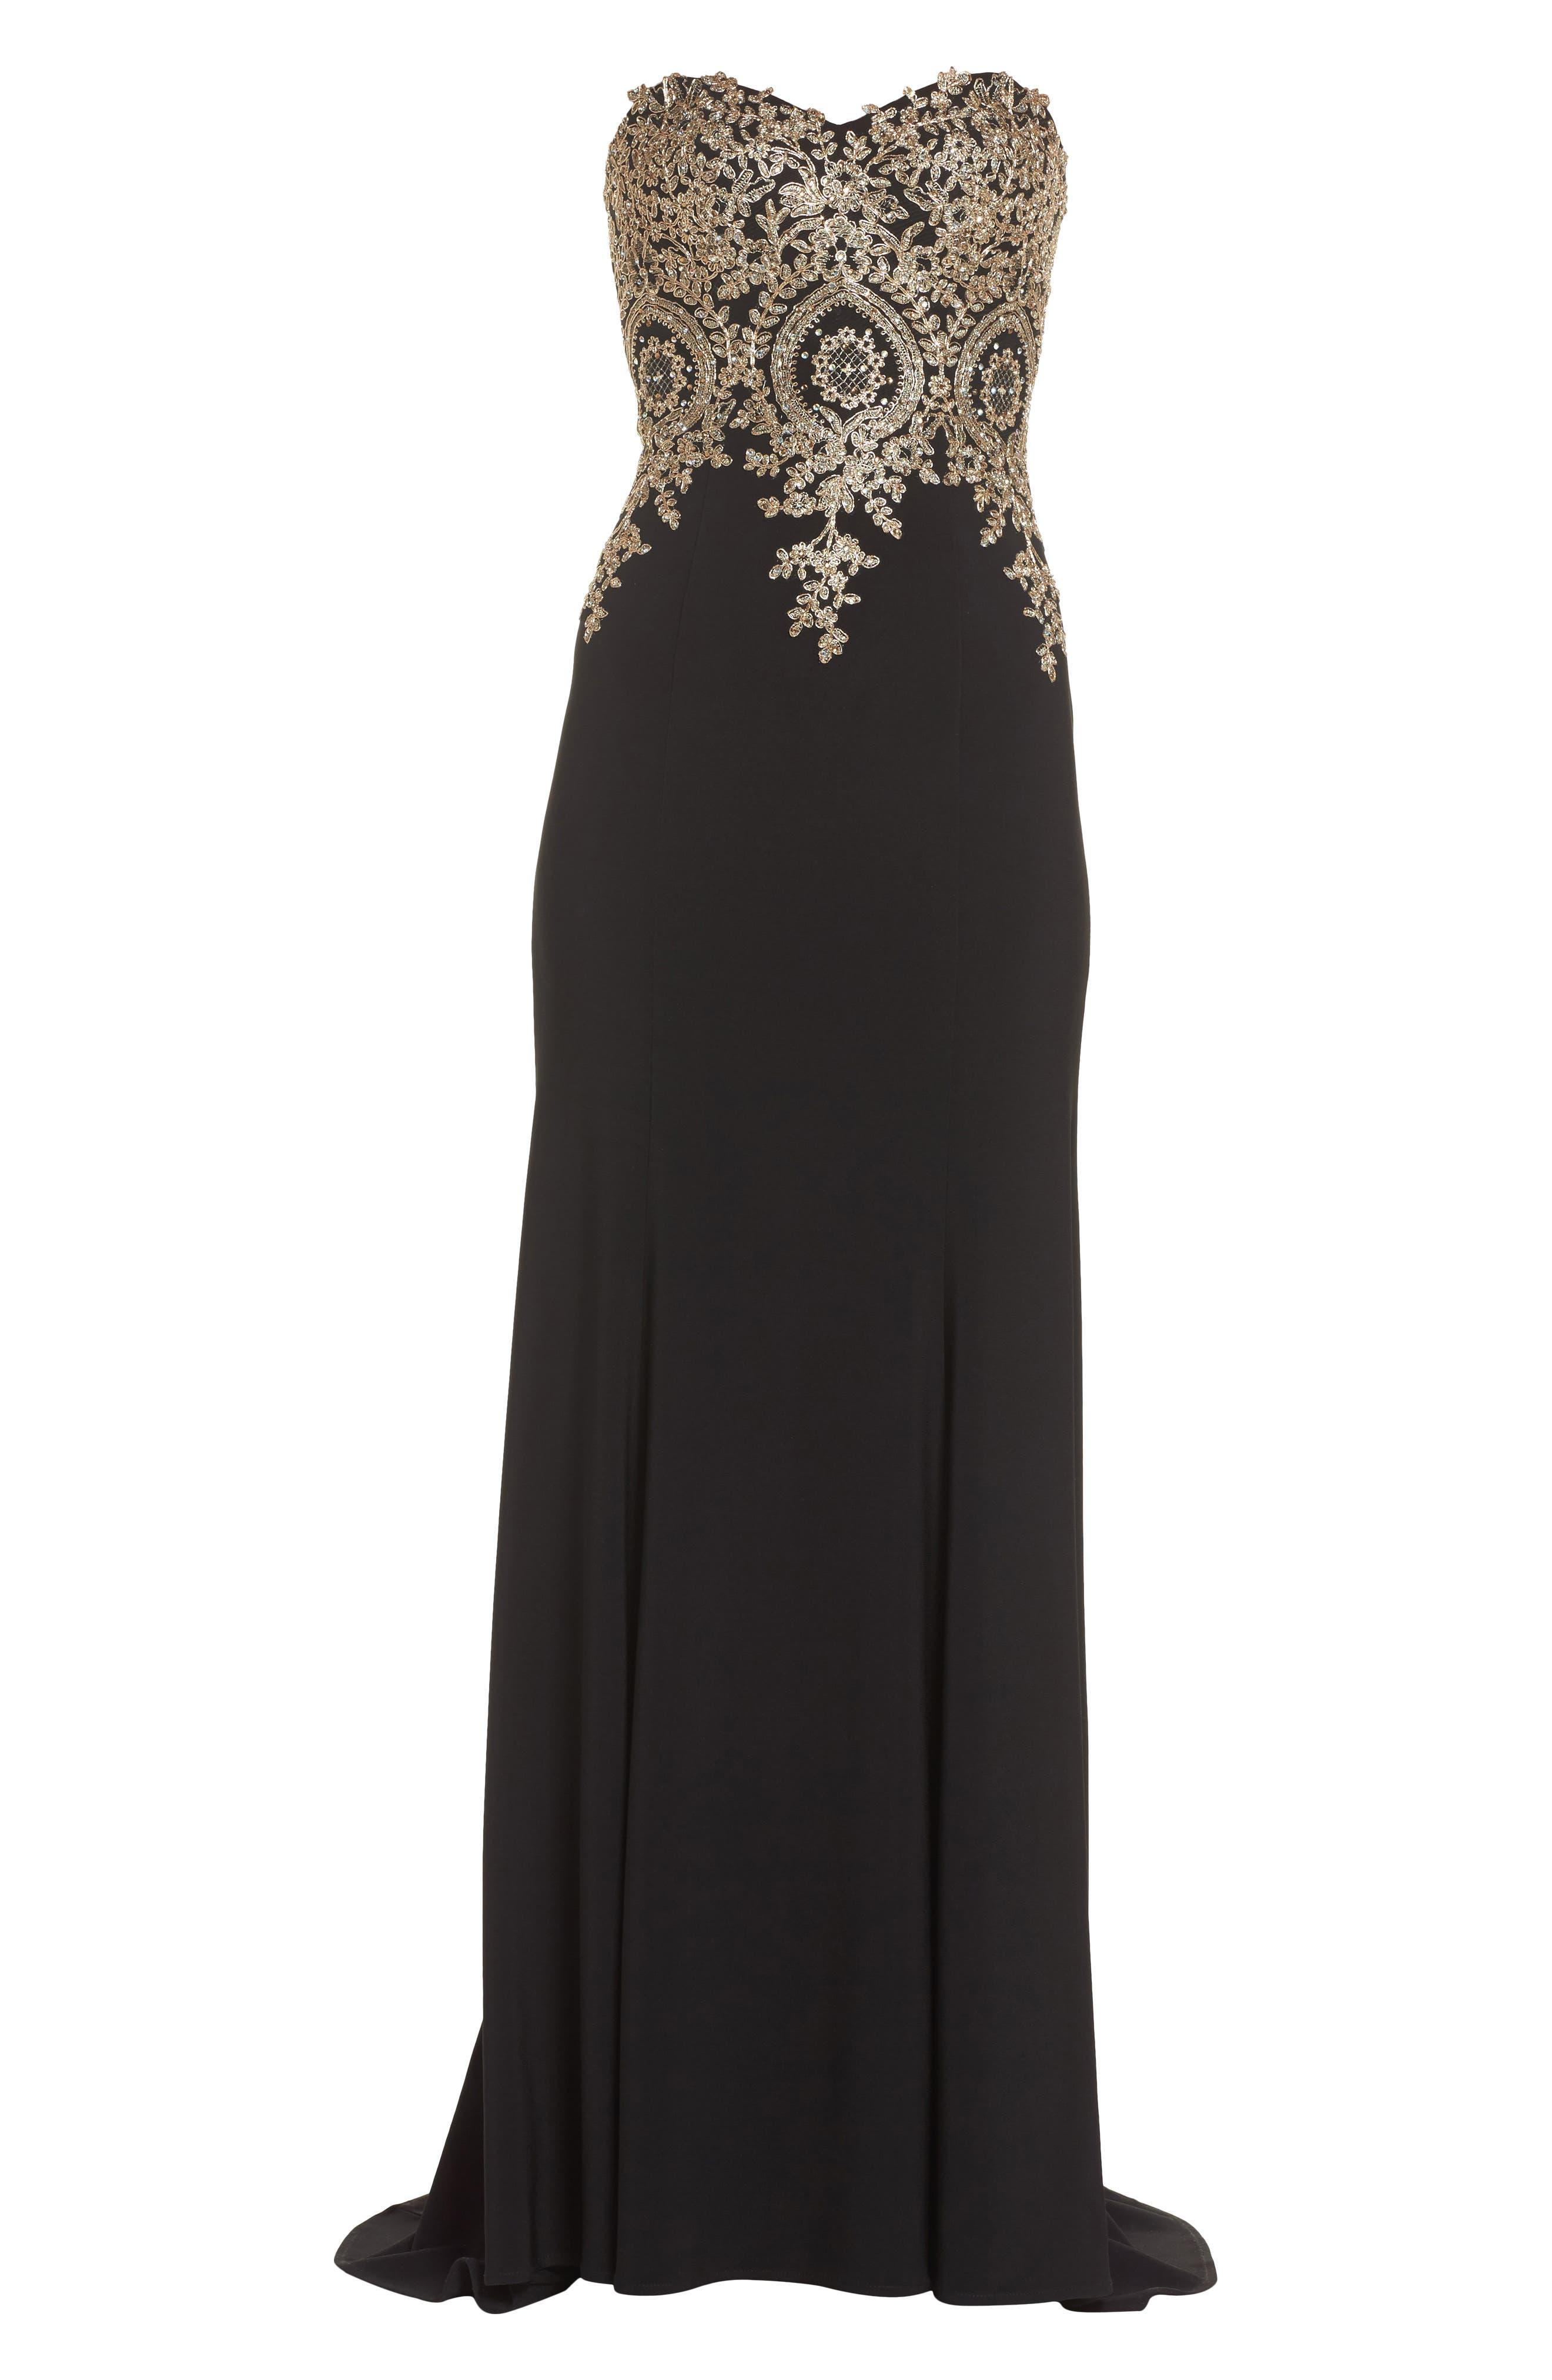 Corset Back Embellished Strapless Gown,                             Alternate thumbnail 6, color,                             Black/ Gold